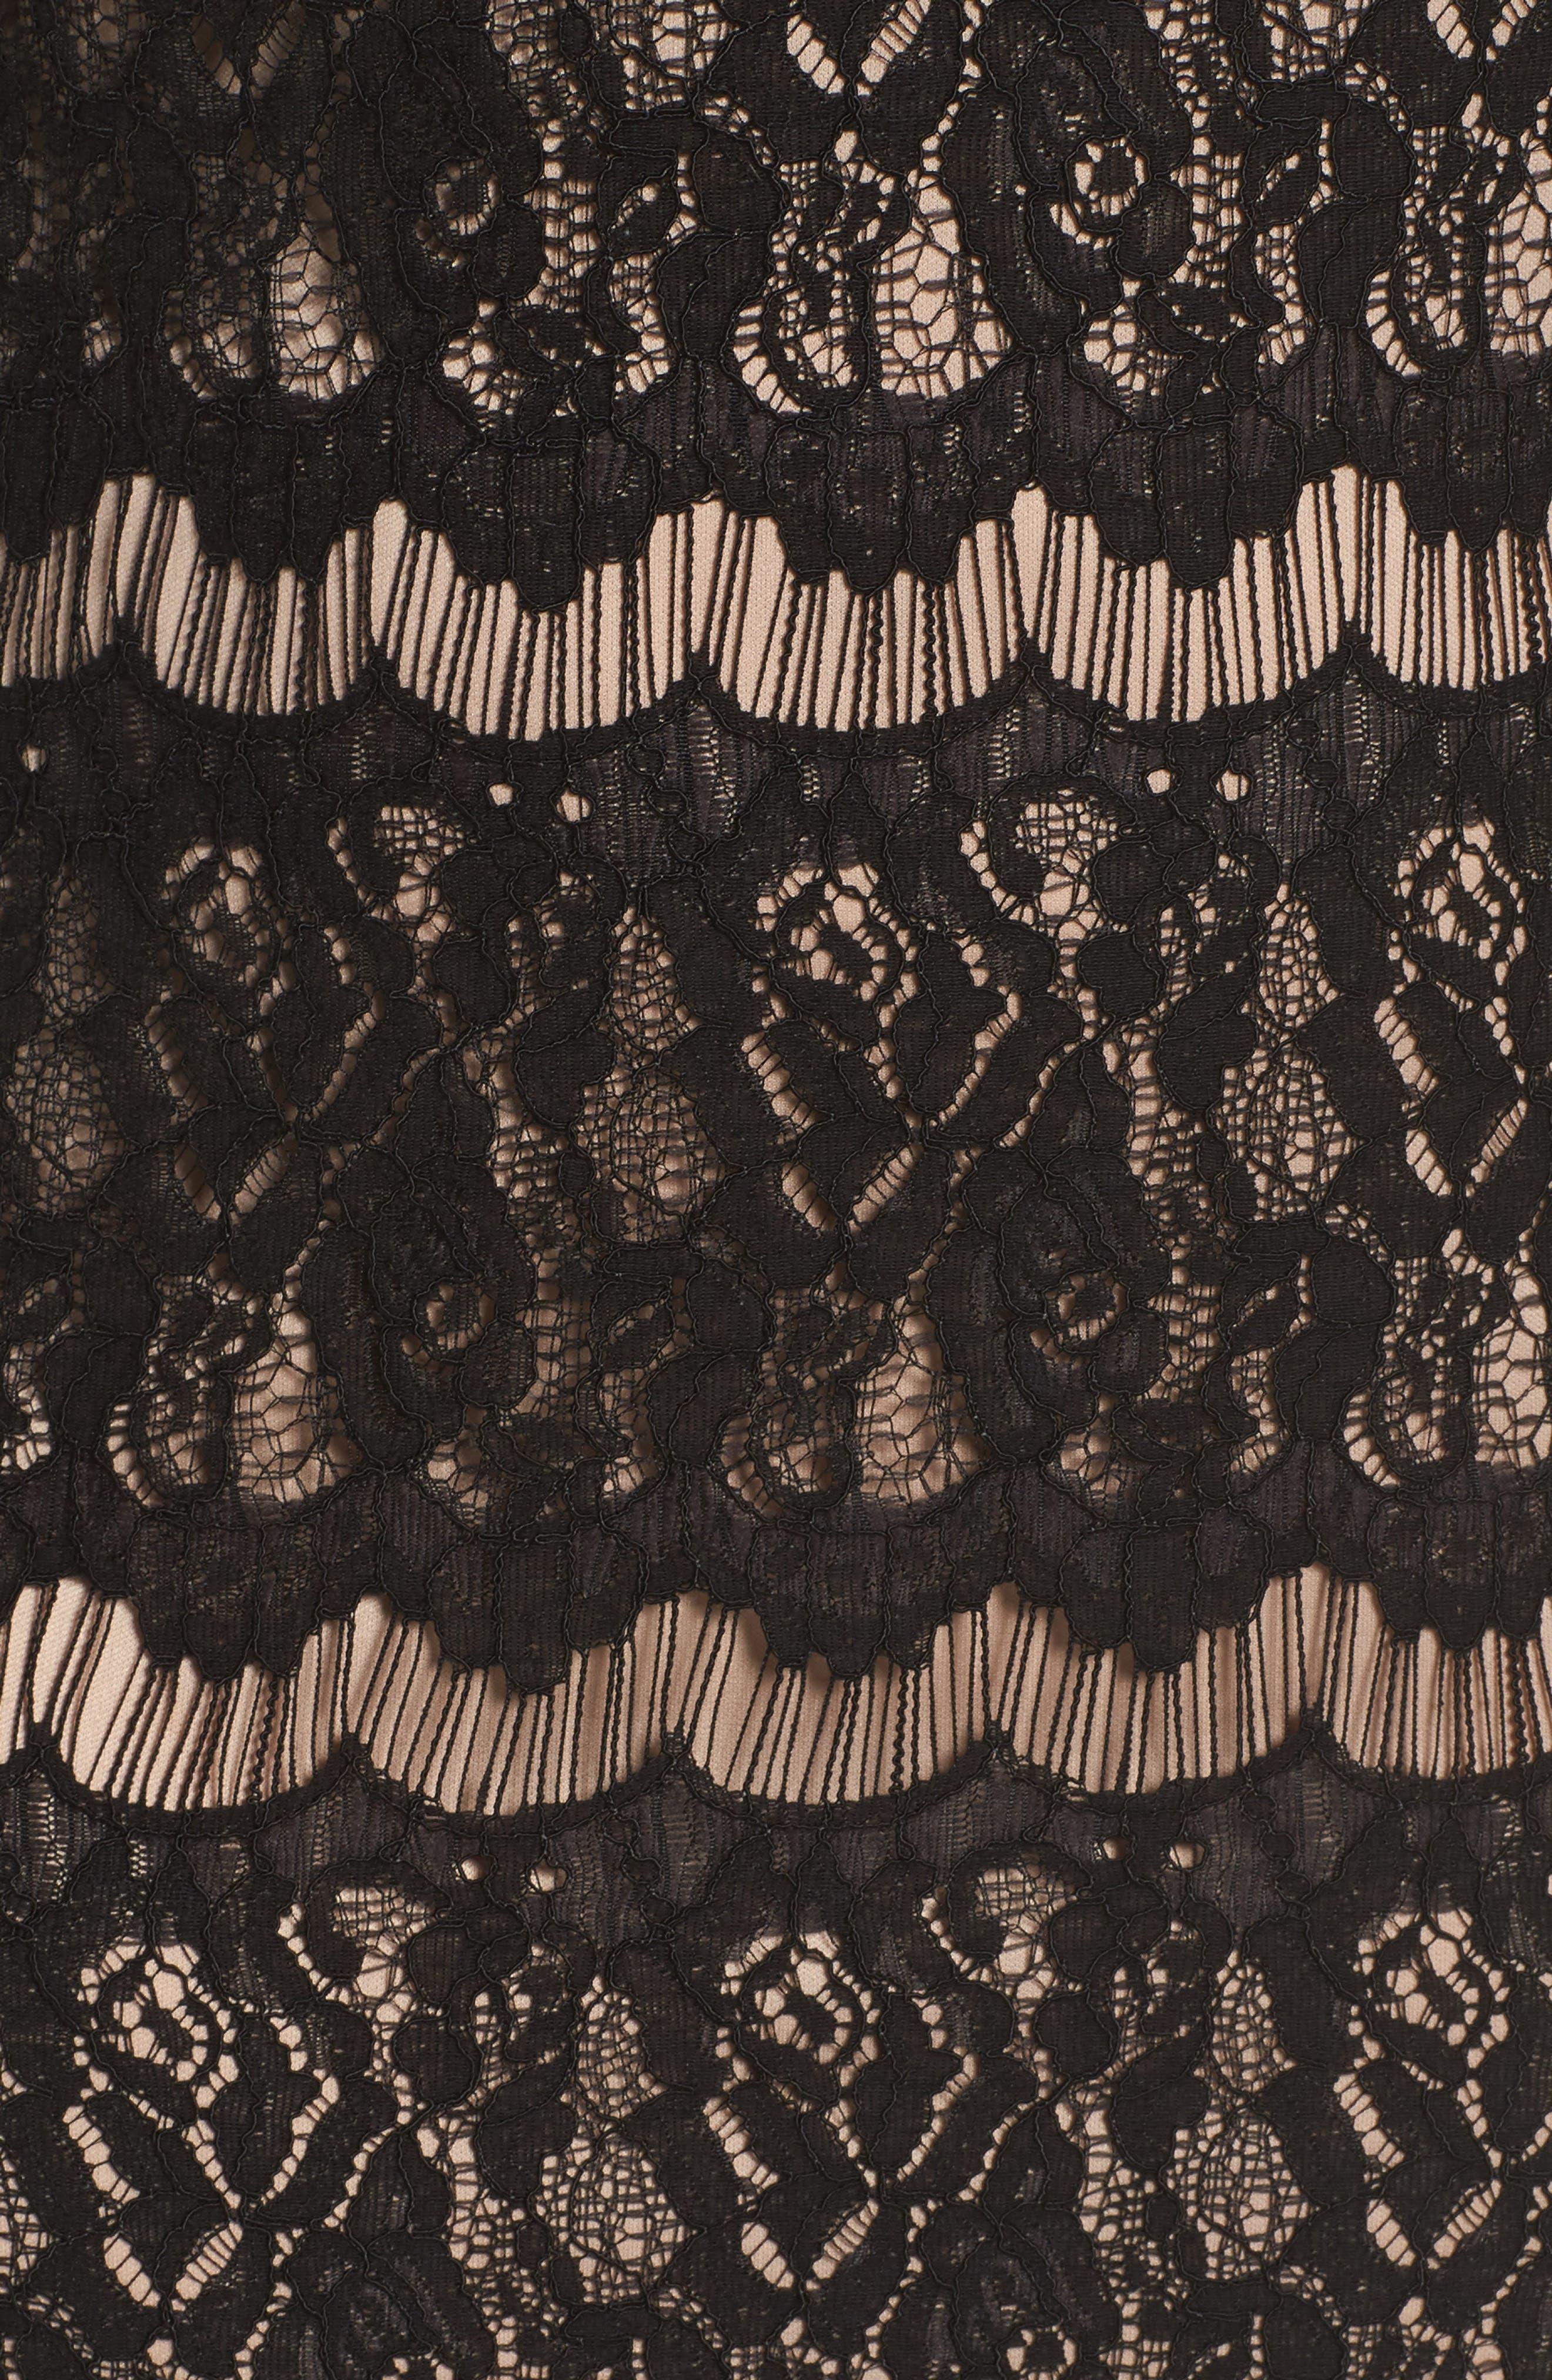 Lace Empire Gown,                             Alternate thumbnail 5, color,                             003